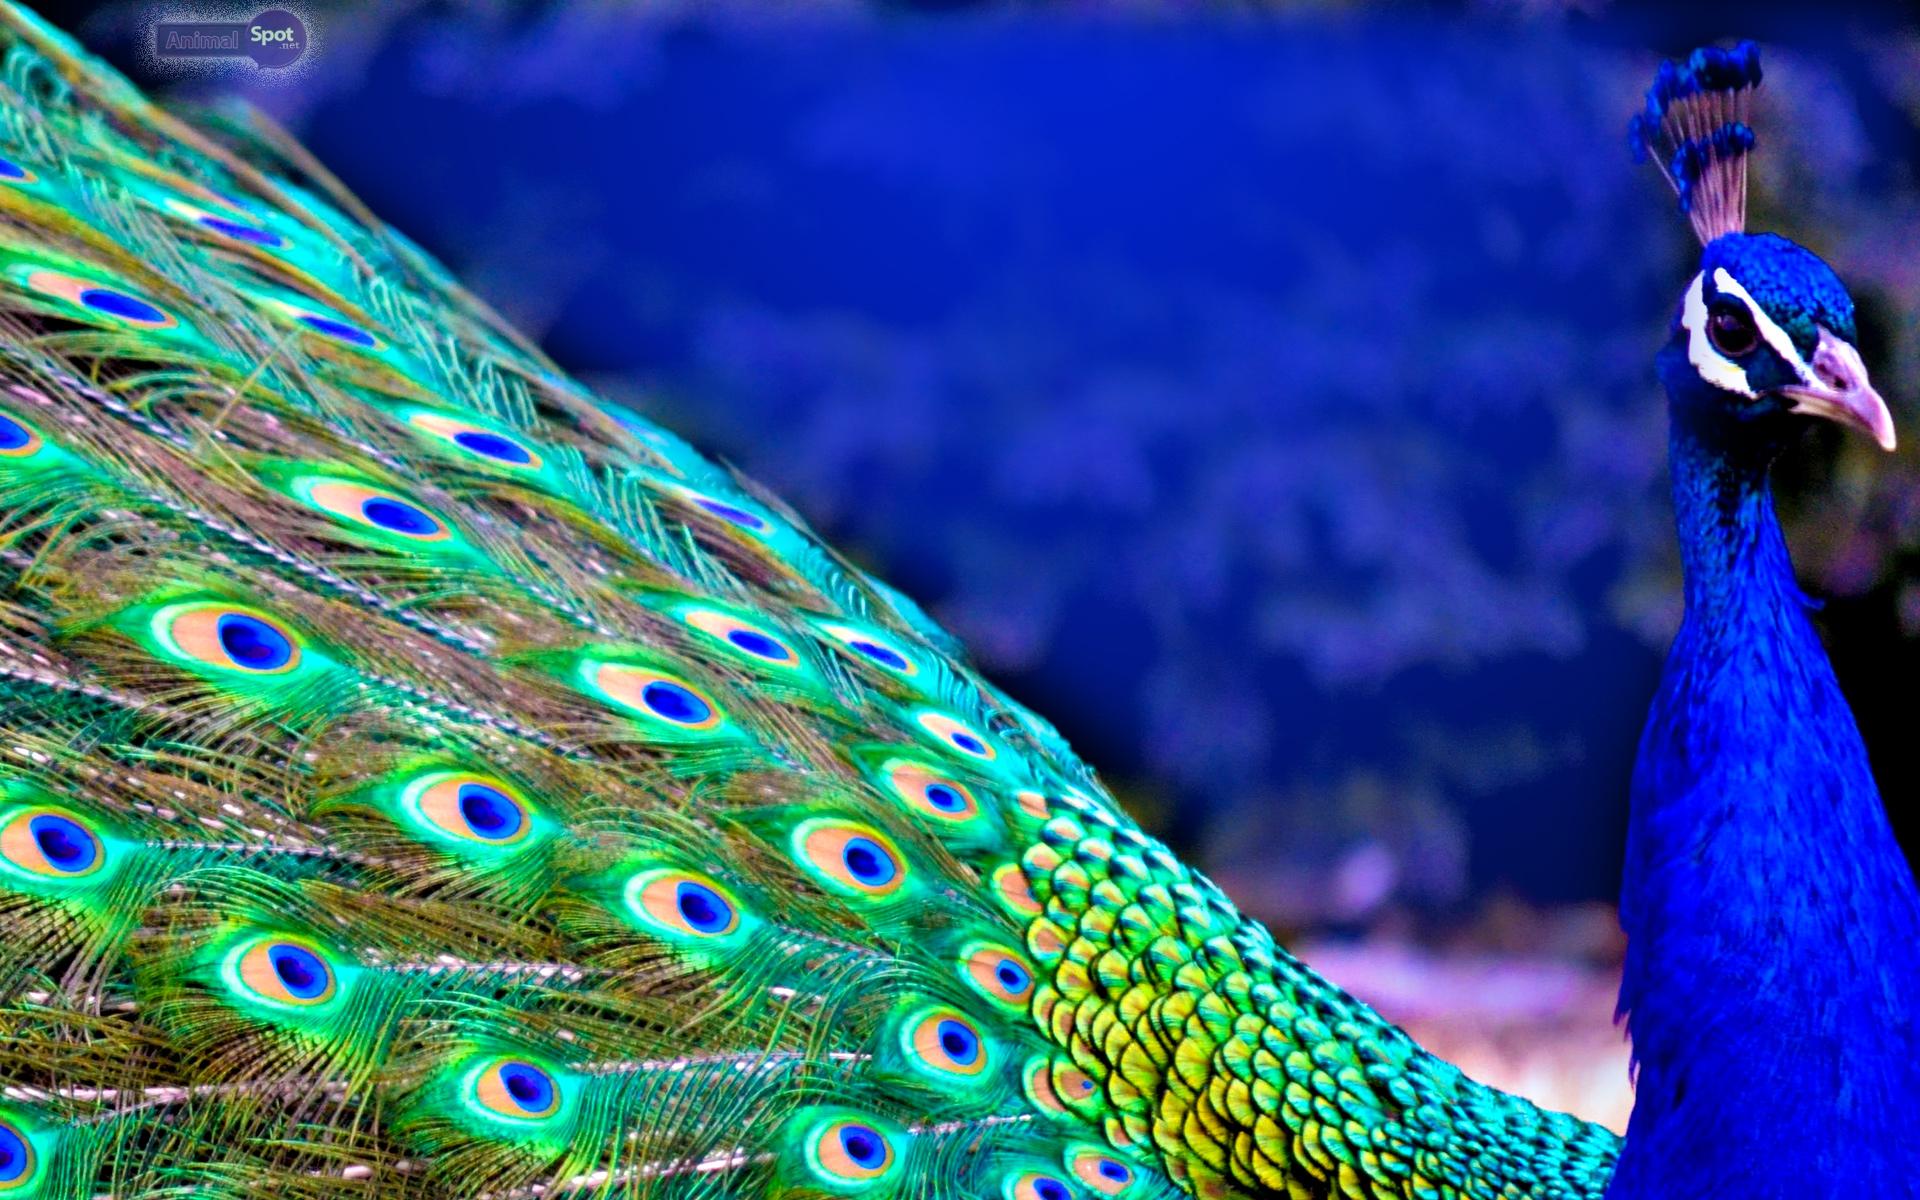 Peacock Wallpapers Animal Spot 1920x1200